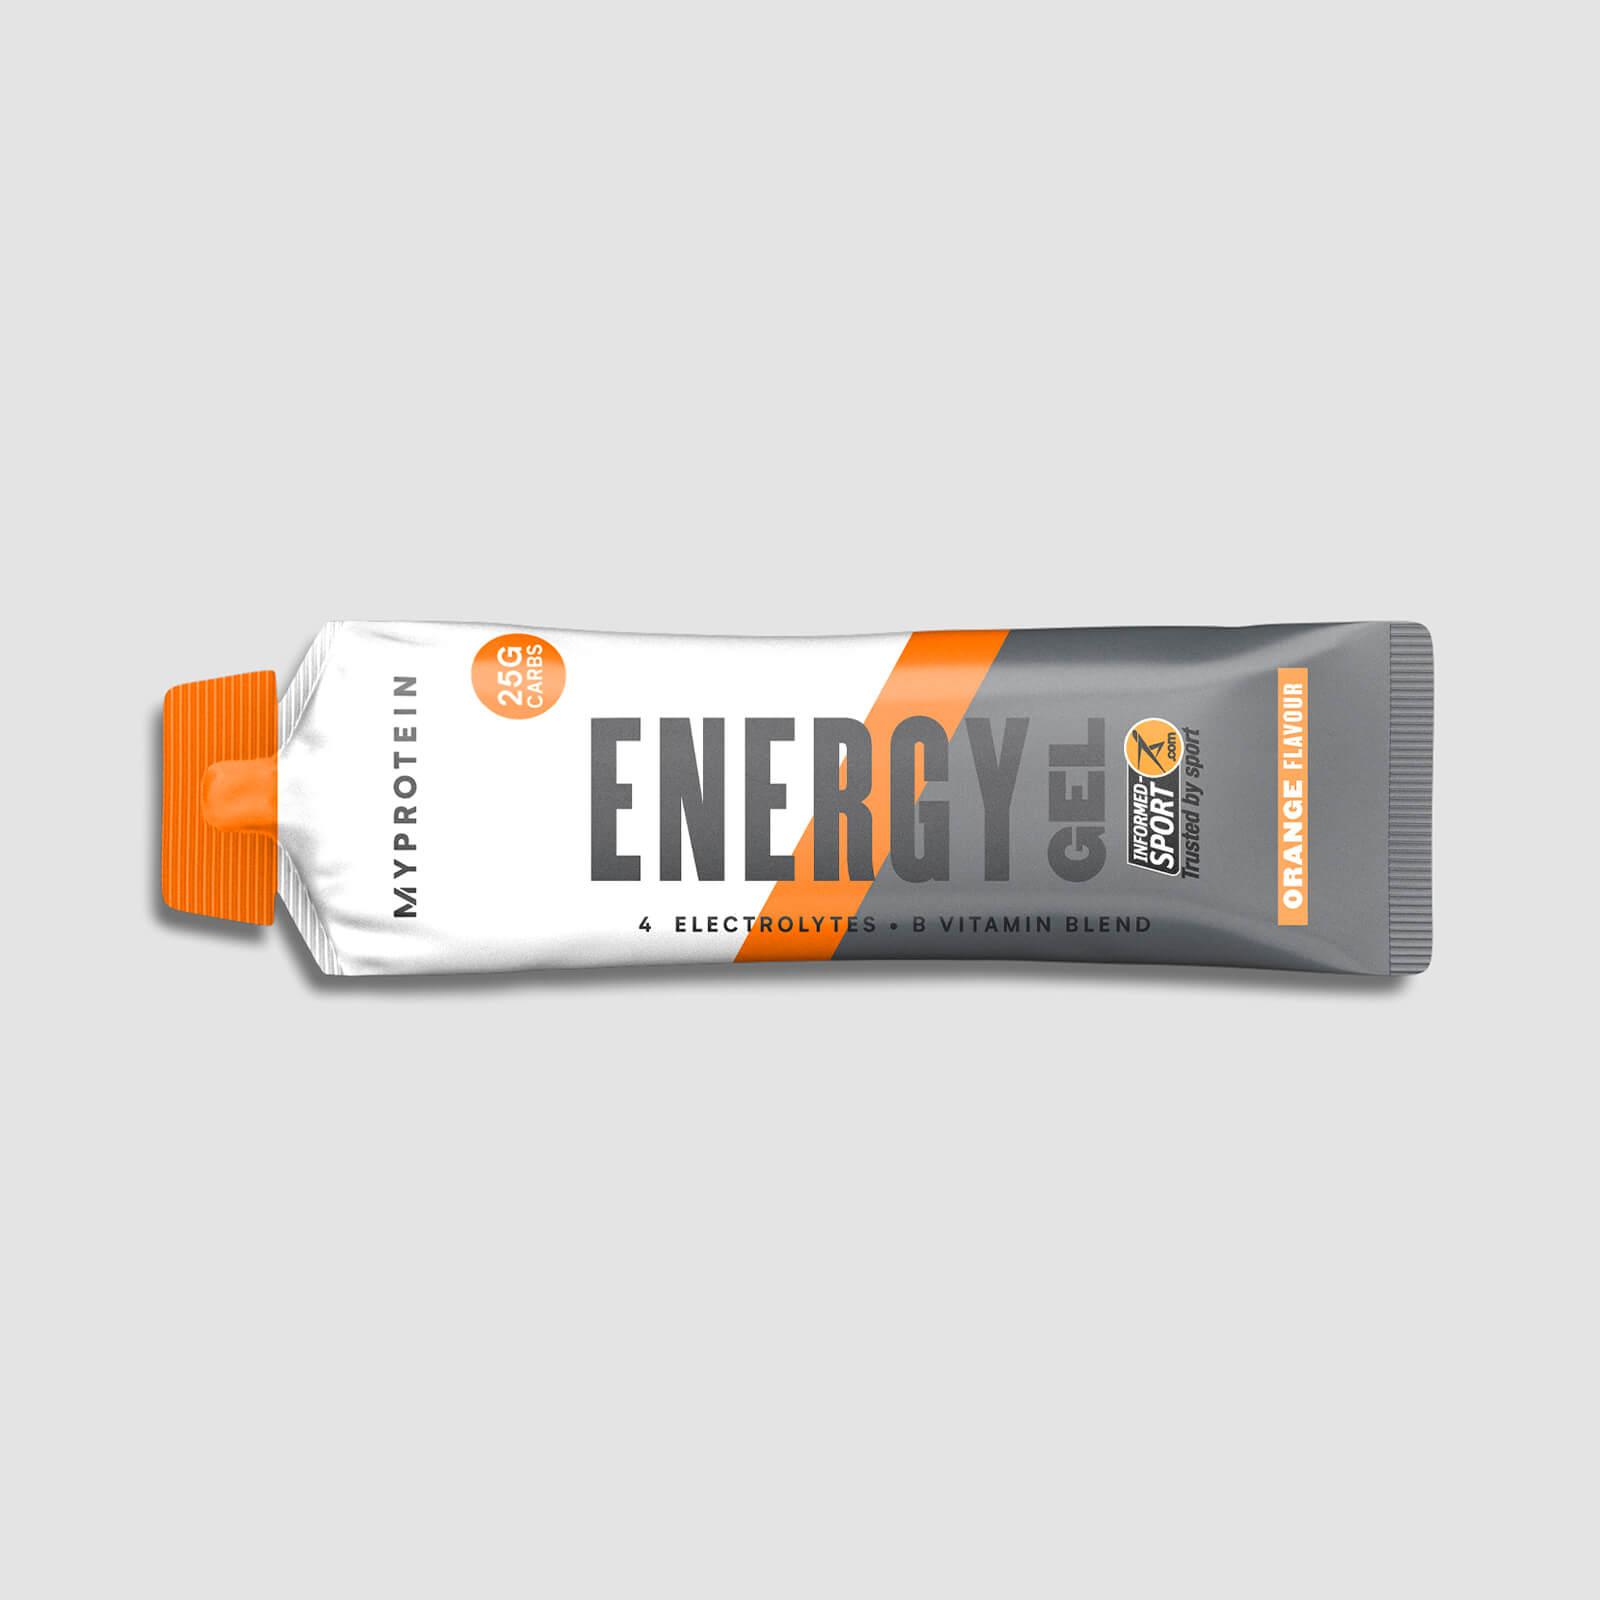 Energie Elite, 50g - 50g - Orange